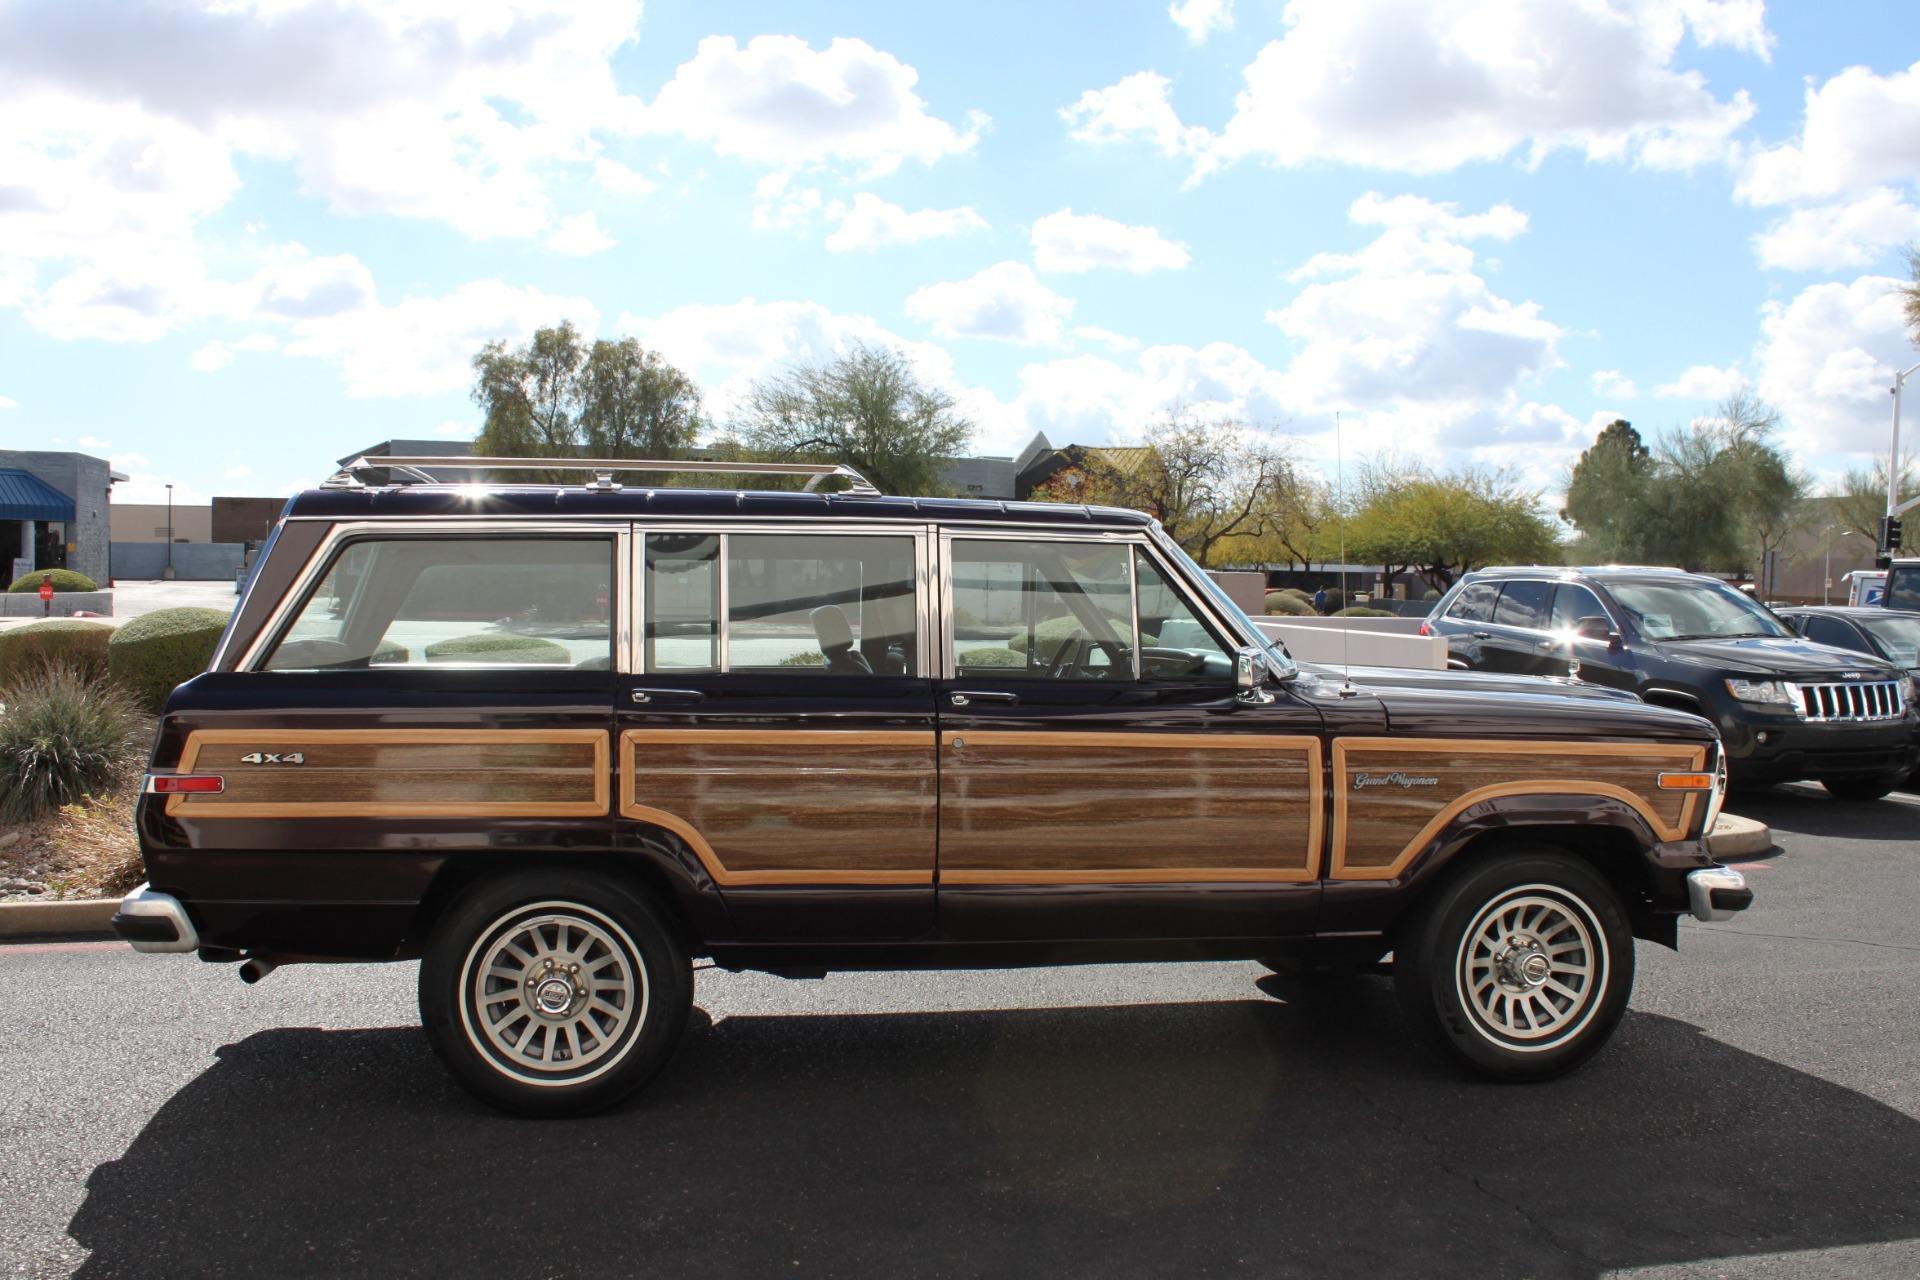 Used-1989-Jeep-Grand-Wagoneer-Chrysler